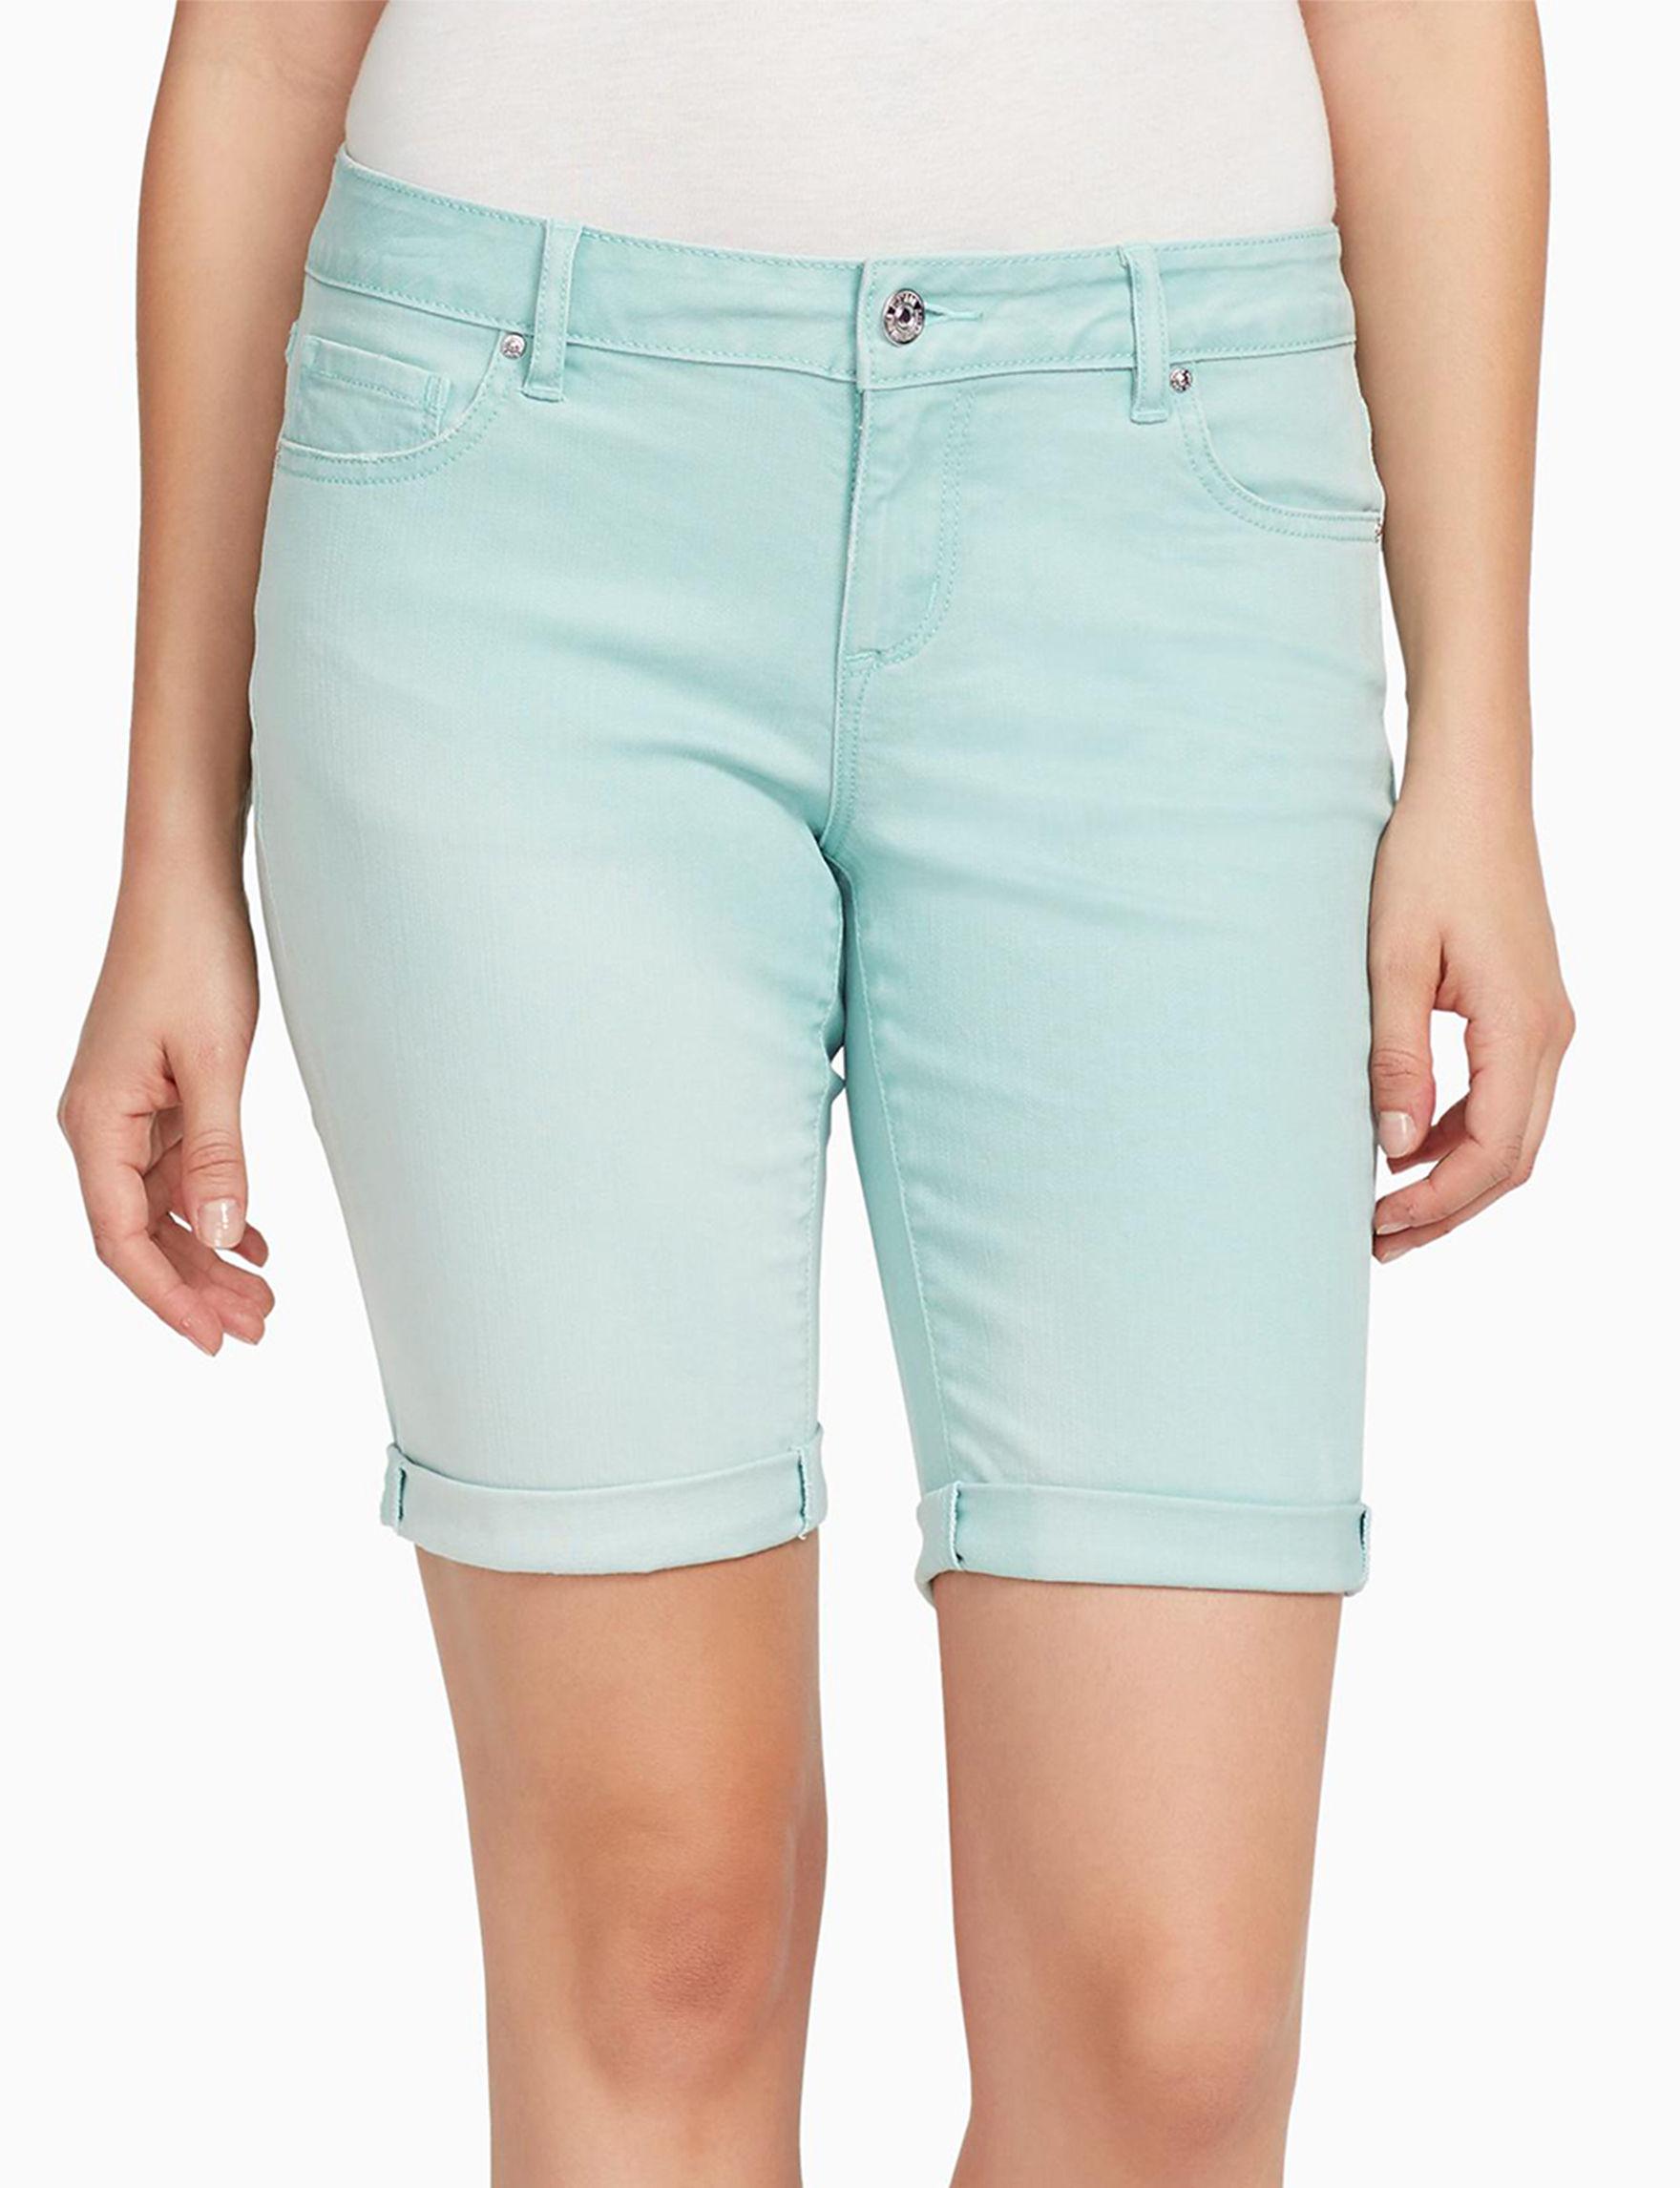 Vintage America Blues Turquoise Bermudas Denim Shorts